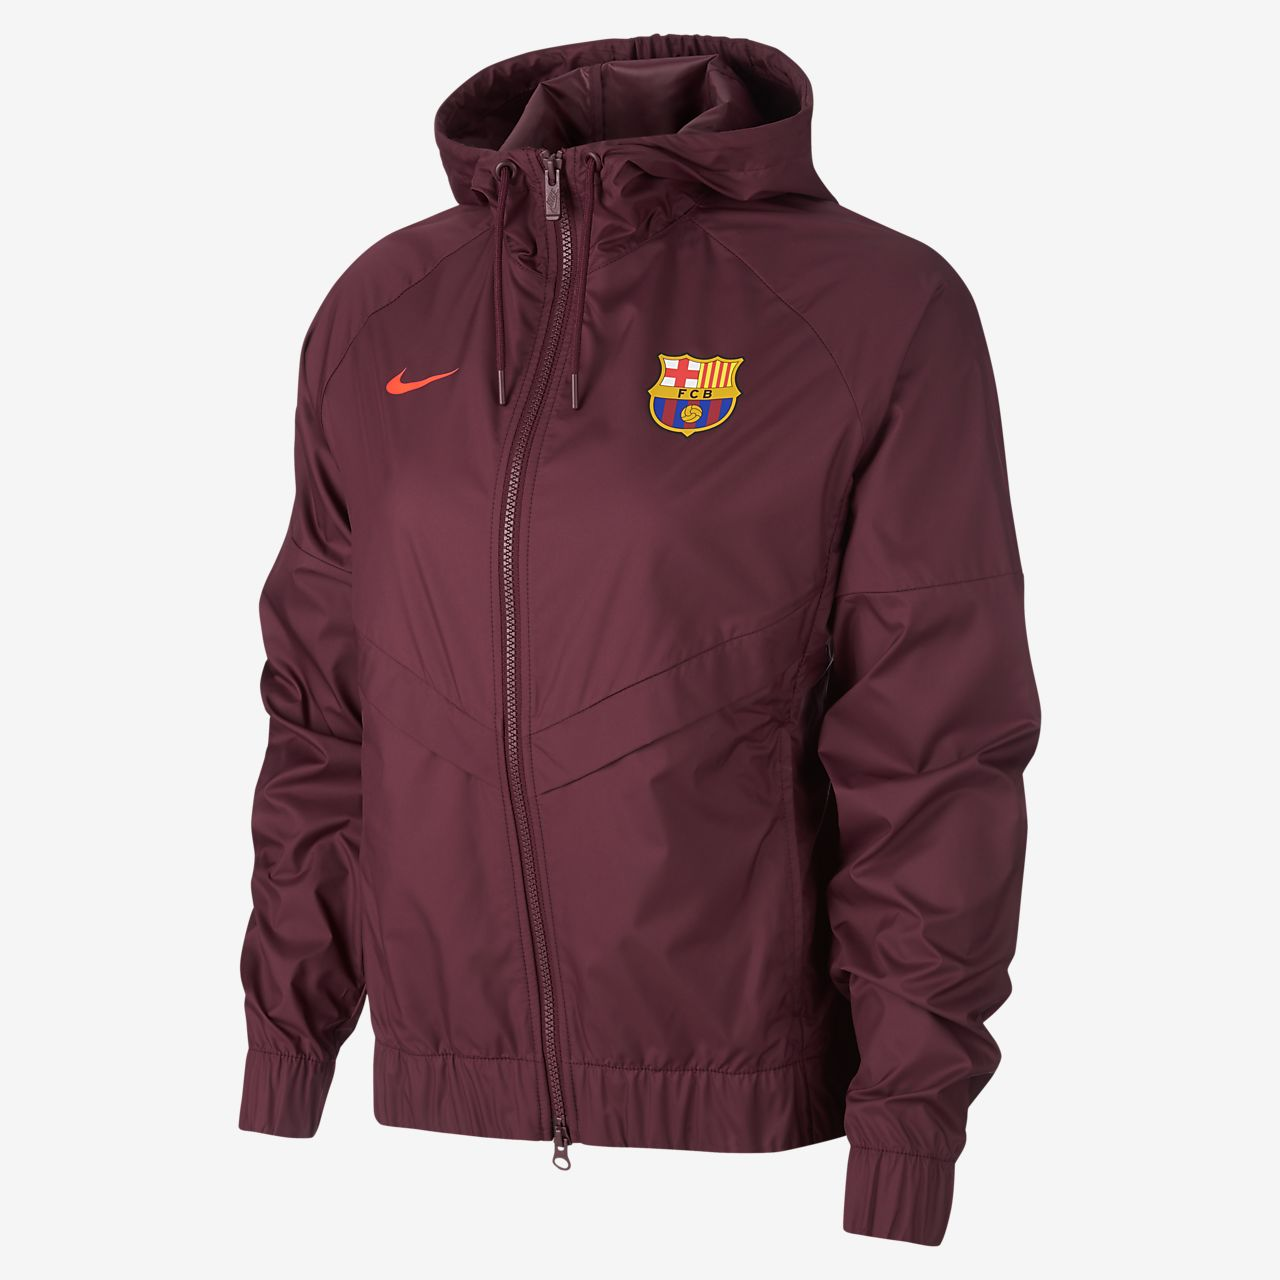 FC Barcelona Authentic Windrunner Women's Jacket